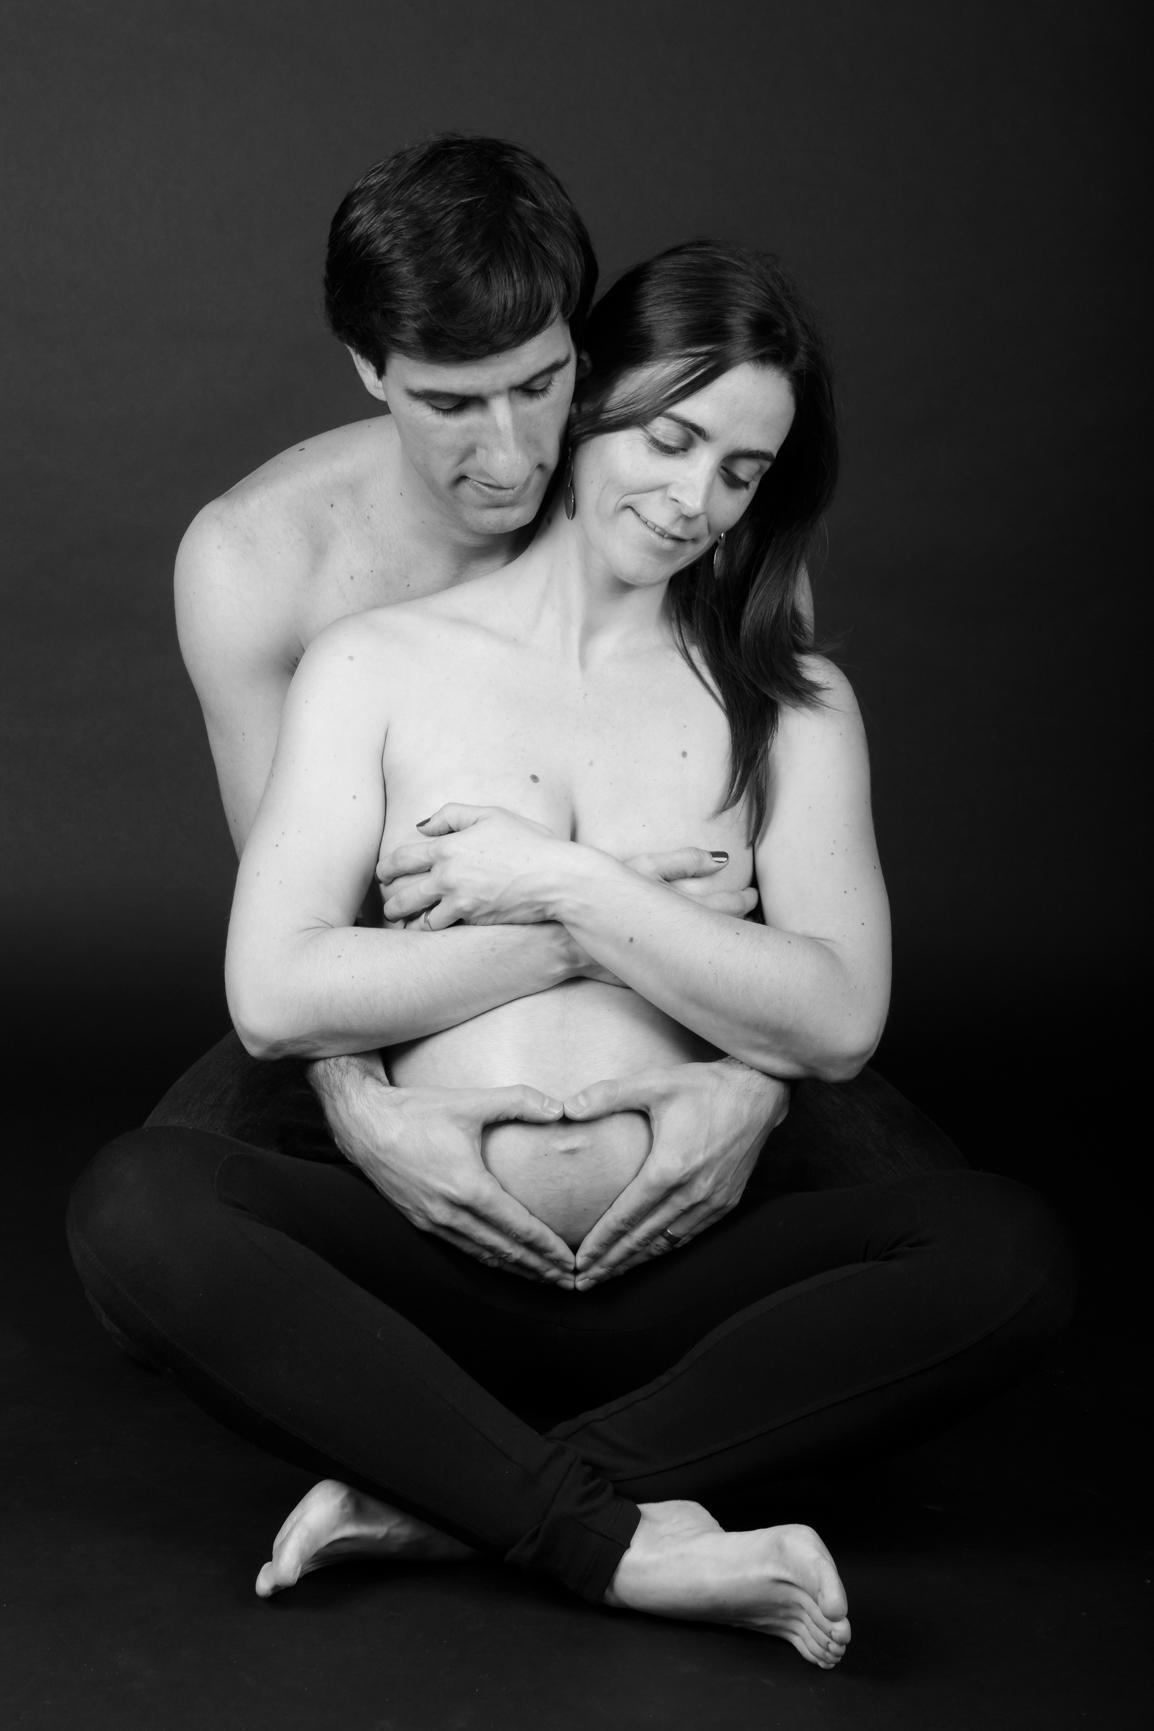 Gravidez   Maternidade   Grávida